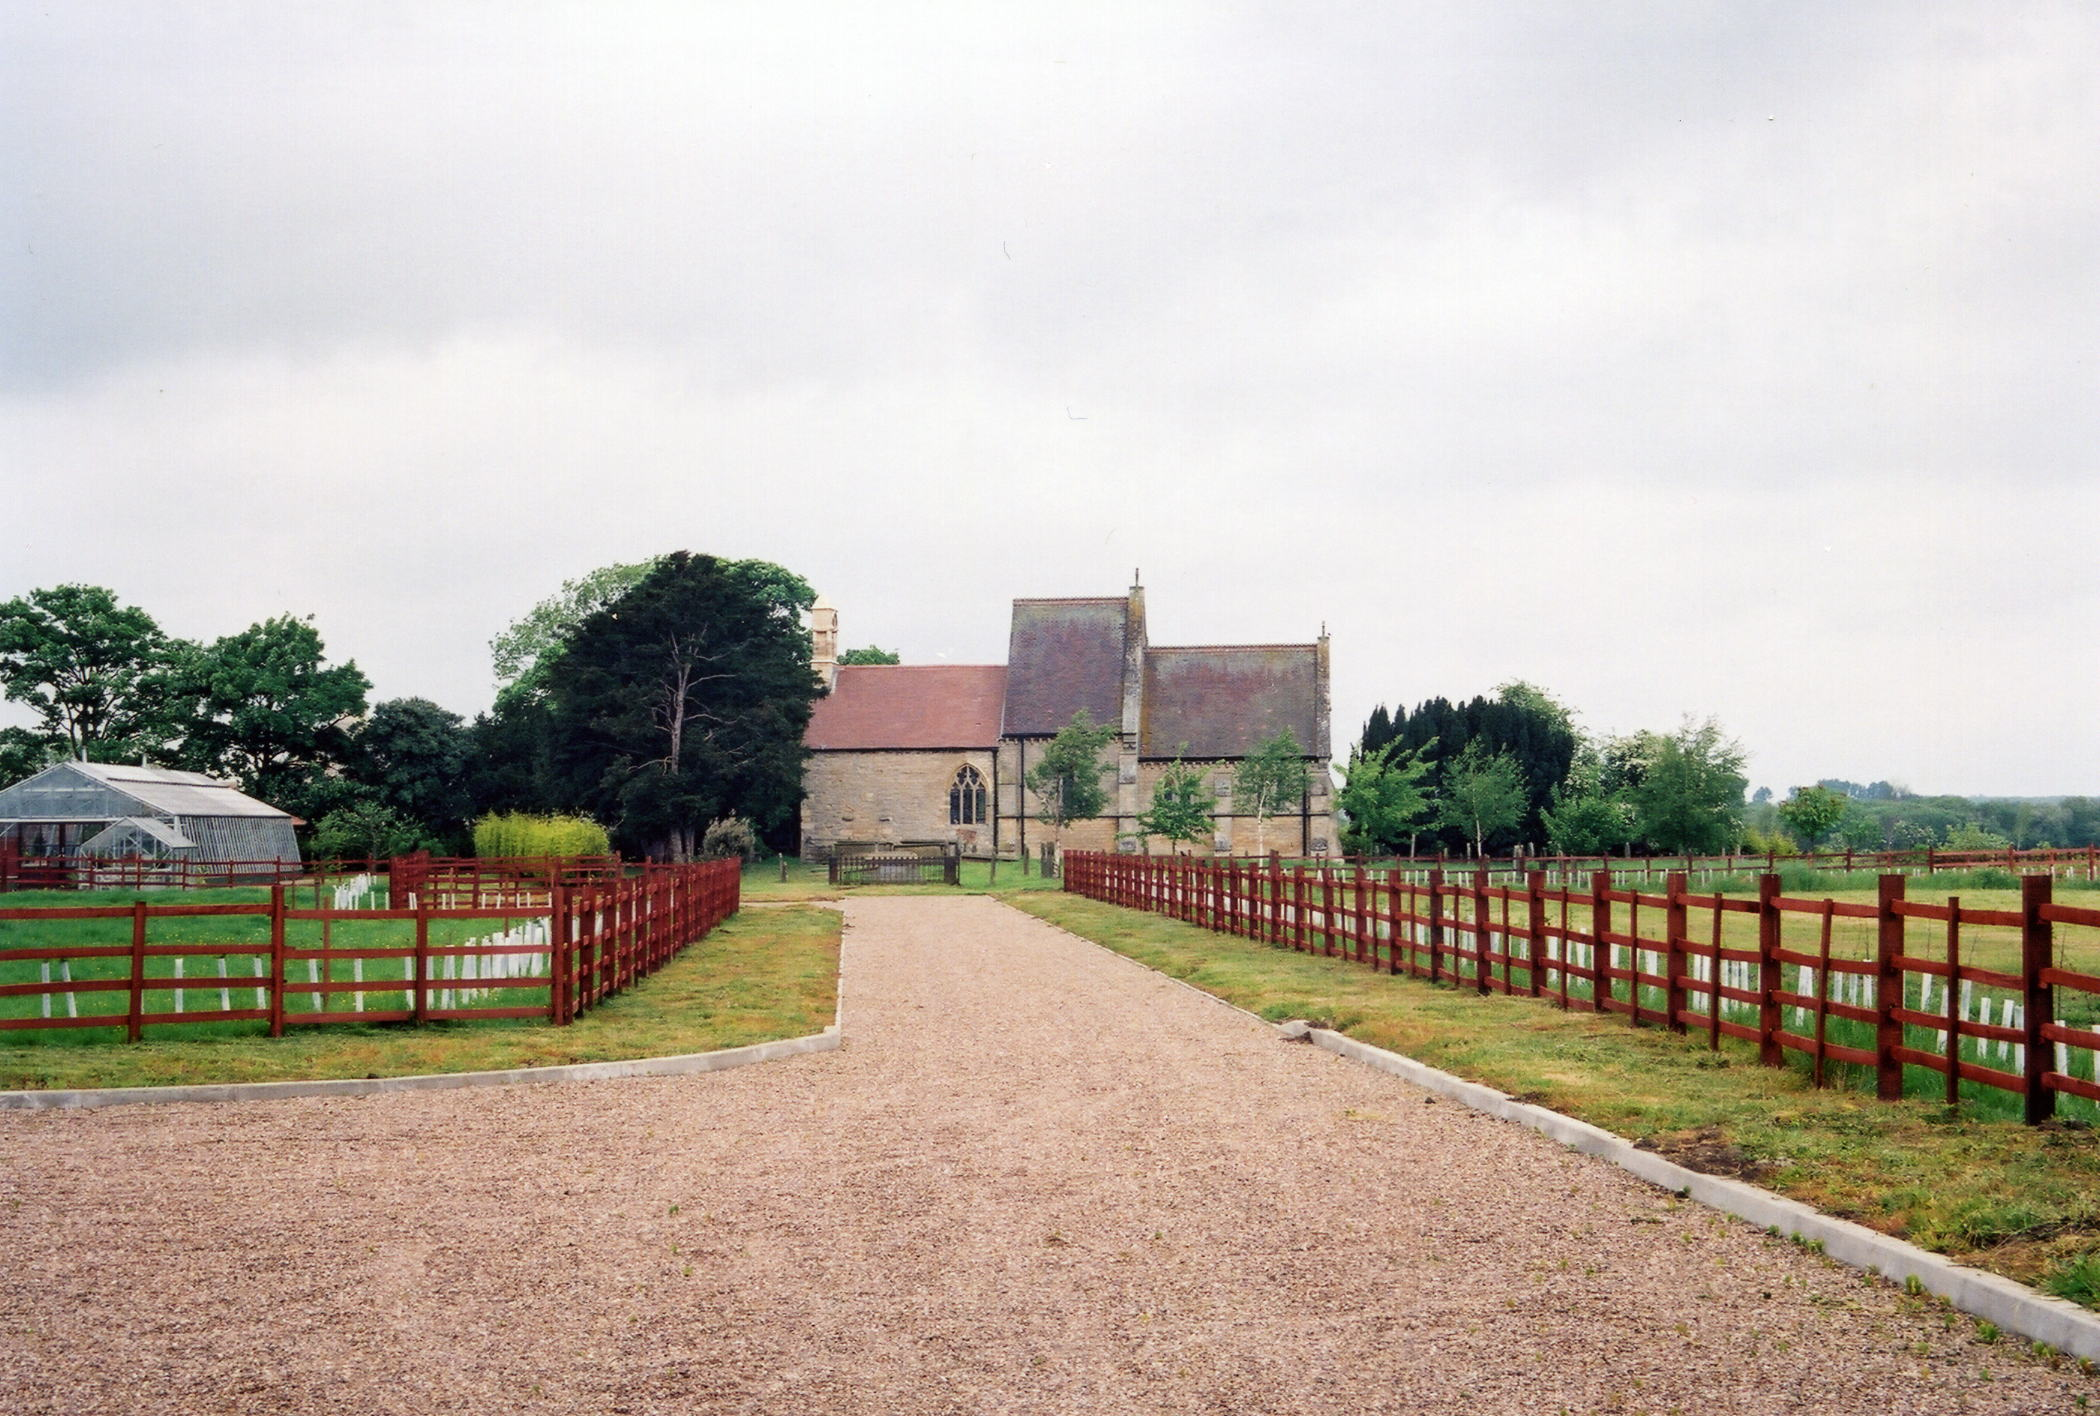 Barlings St. Edward parish church